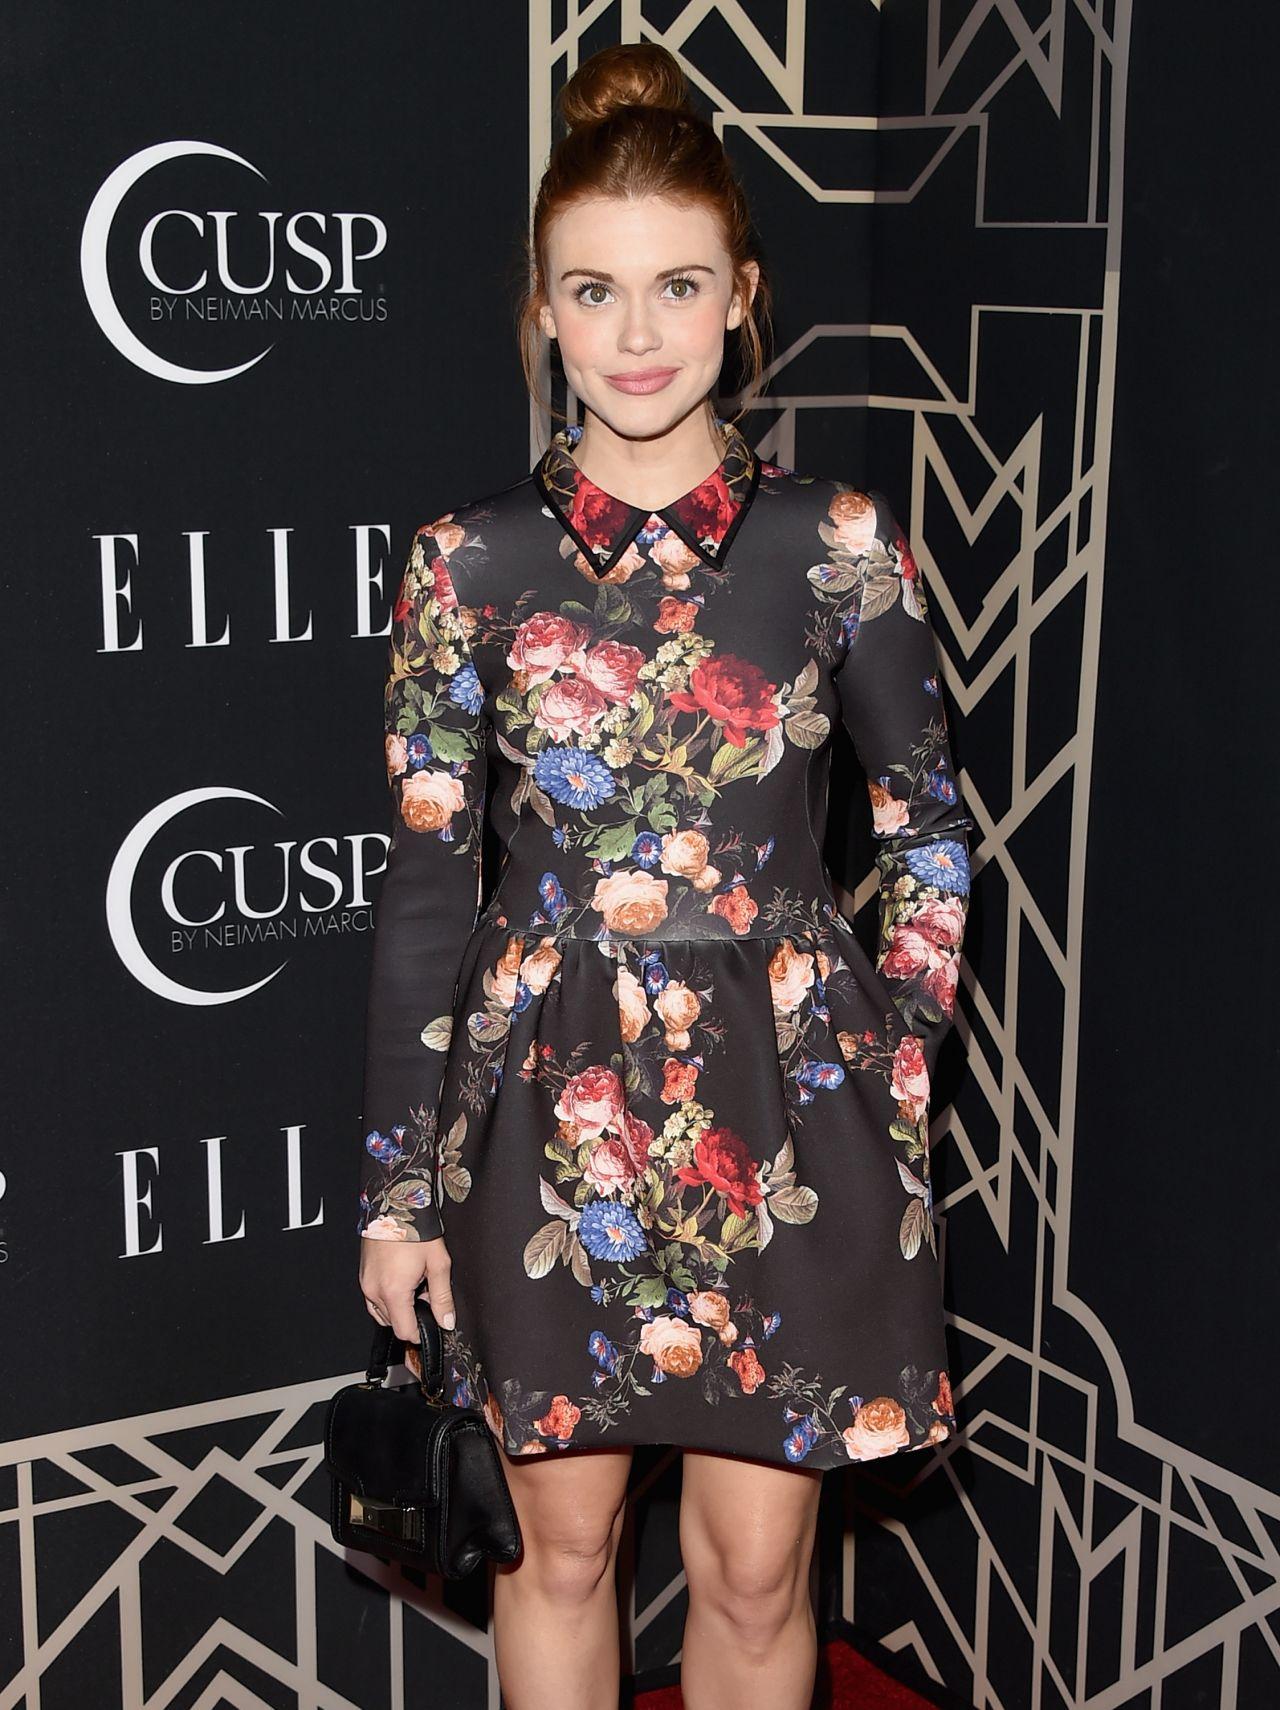 Holland Roden in Erin by Erin Fetherston Dress – 2014 ELLE Women In Music Celebration in Hollywood